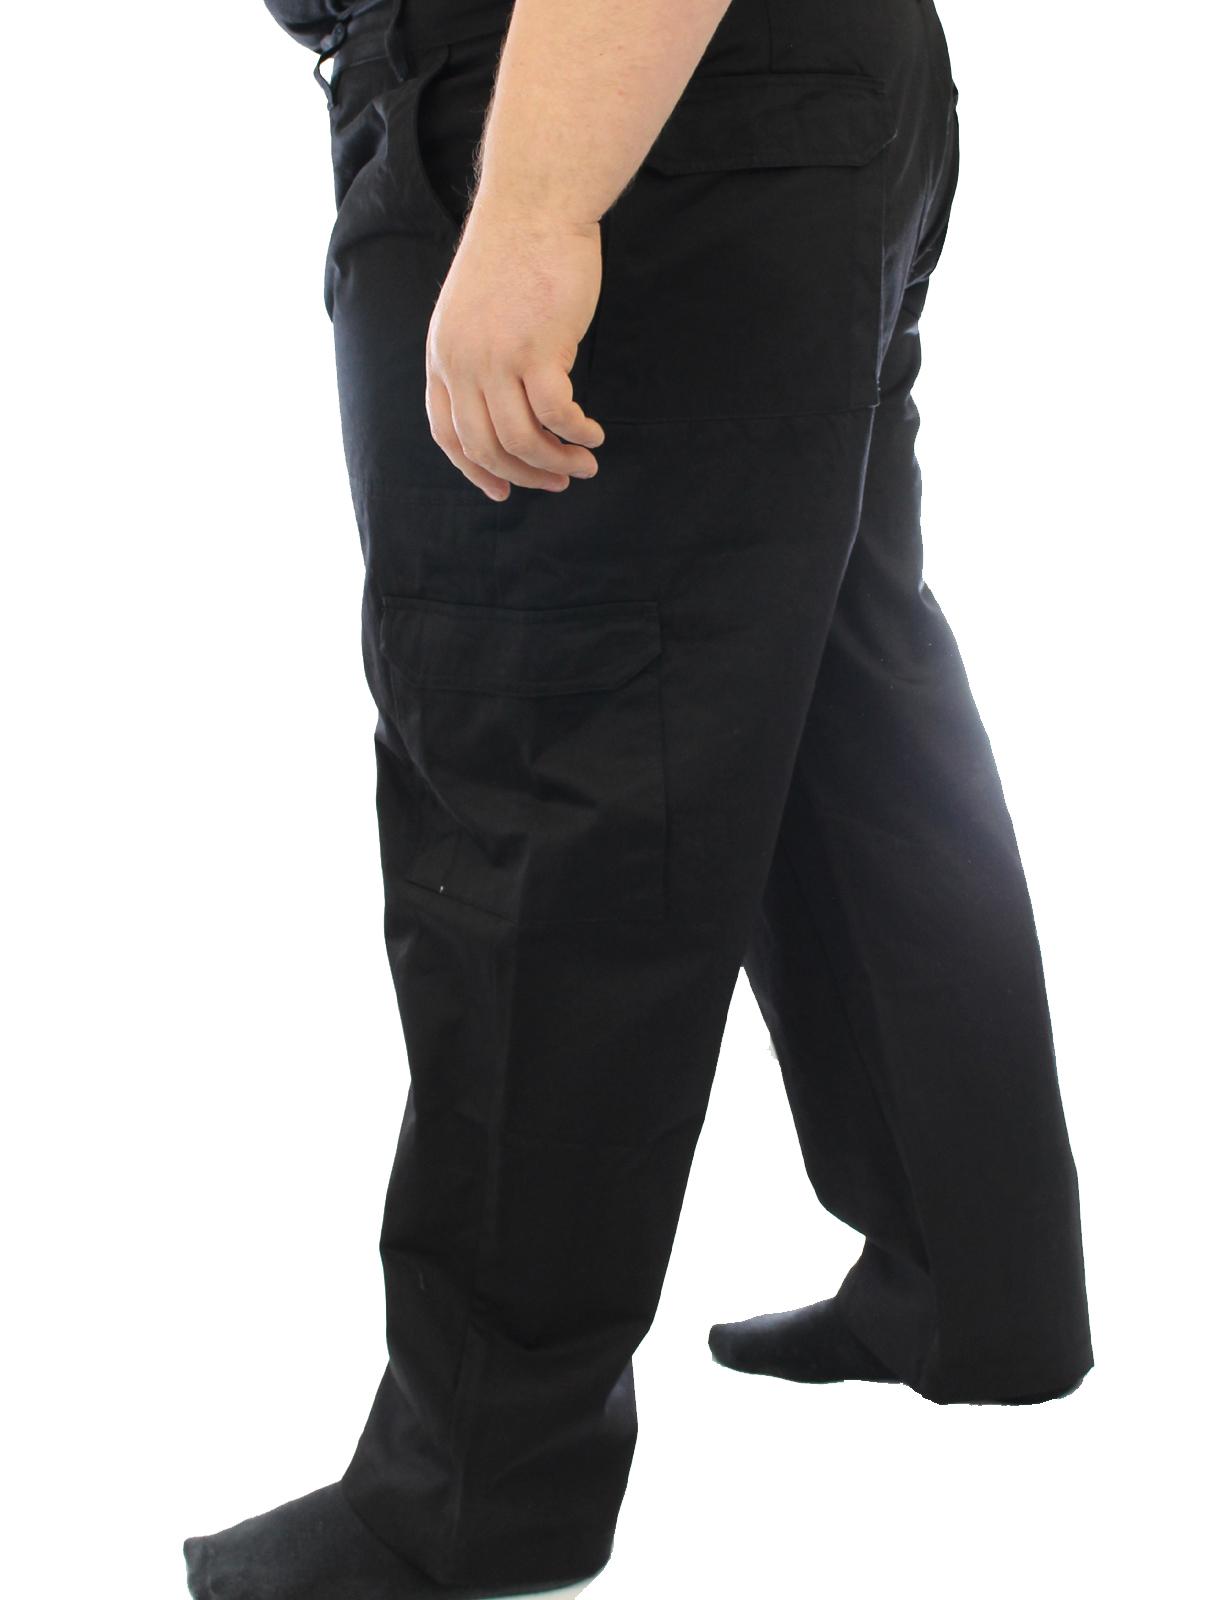 "Ed Baxter Victory - Heavy Duty Cargo Combat Trousers - Black - 44"" Waist, 34"" Leg"